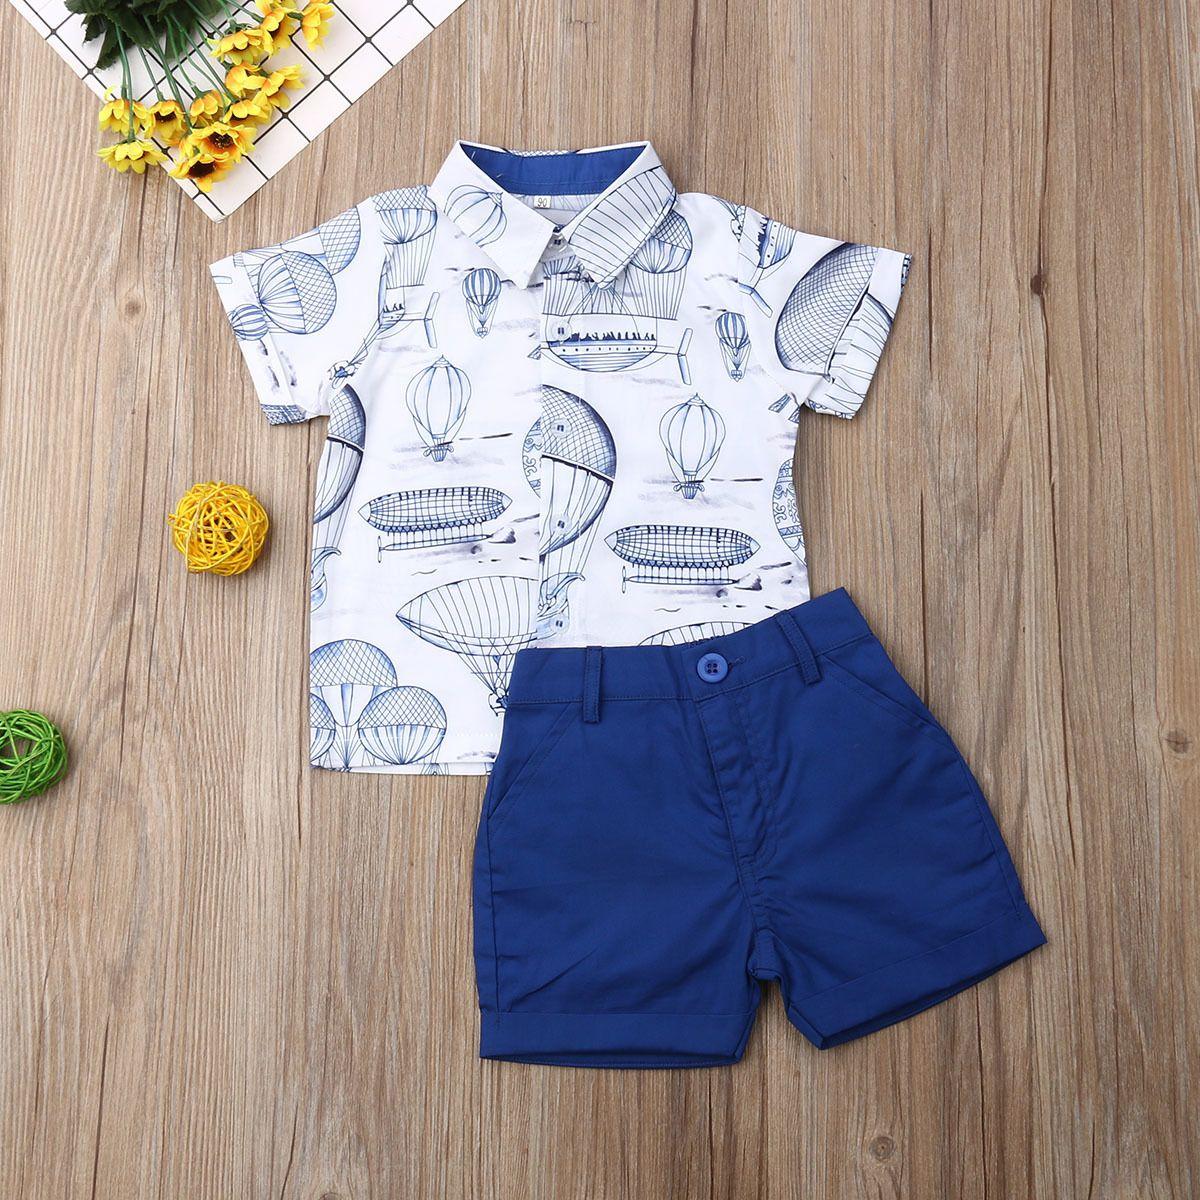 tiefblaues Kleinkind Kinder Gentleman Outfit Baby-Kleidung stellen Kinder formale Klage Camo Hemd Top + Shorts Jungen-Sommer-Kleidung 2pcs 1-6T 2020